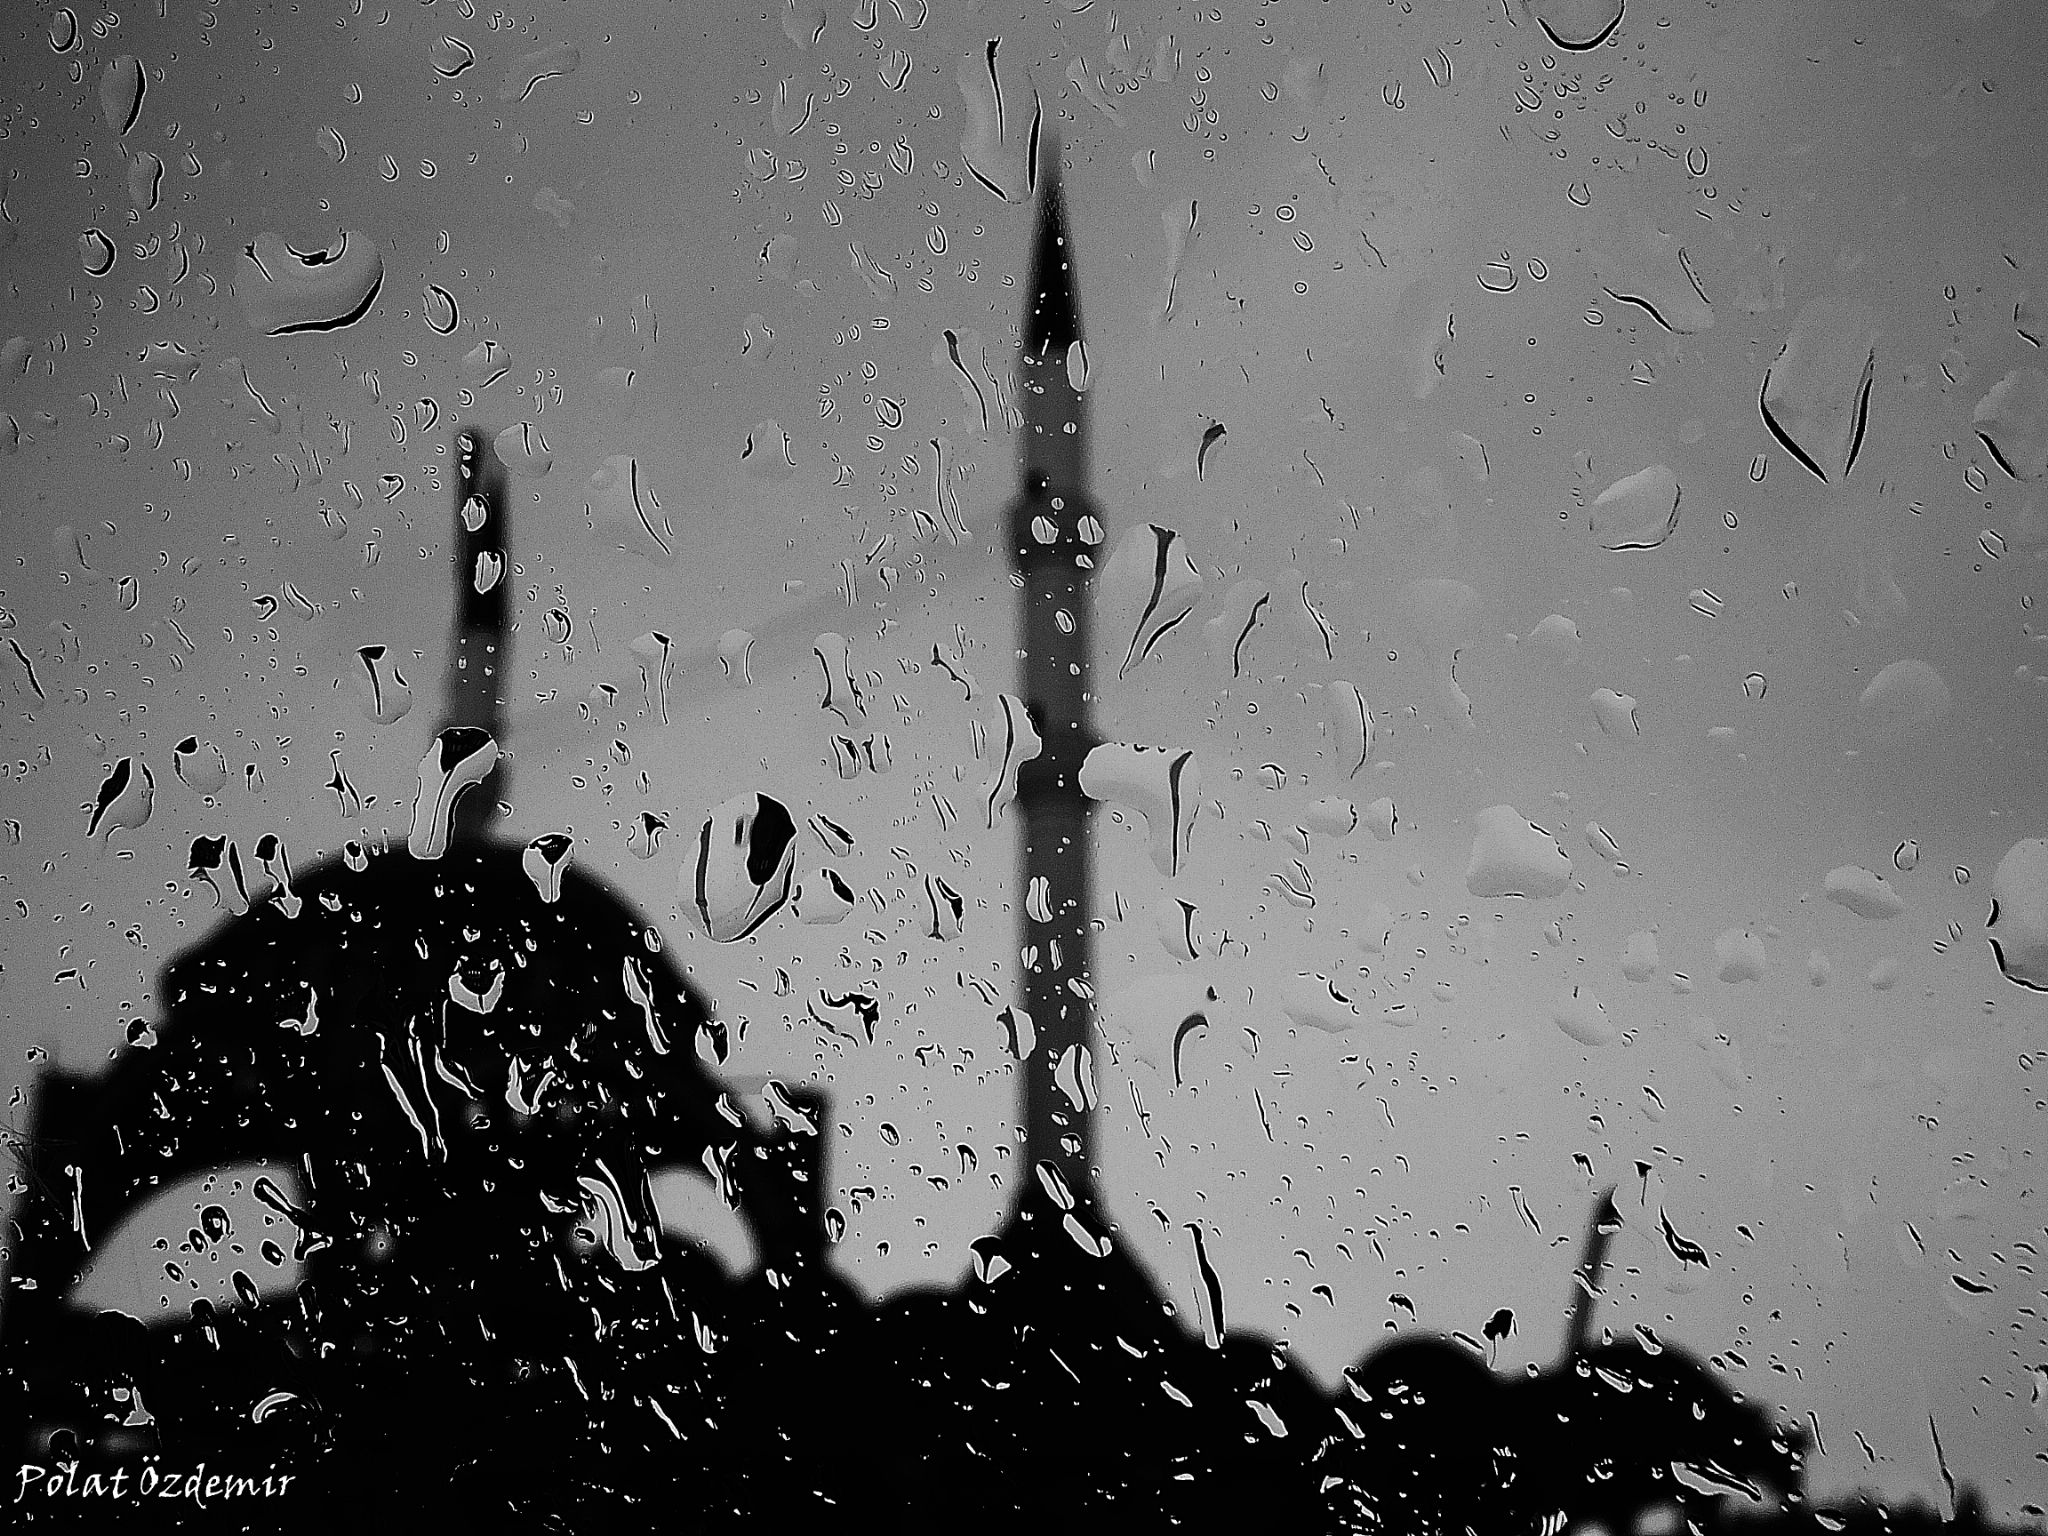 Untitled by Polat ÖZDEMİR